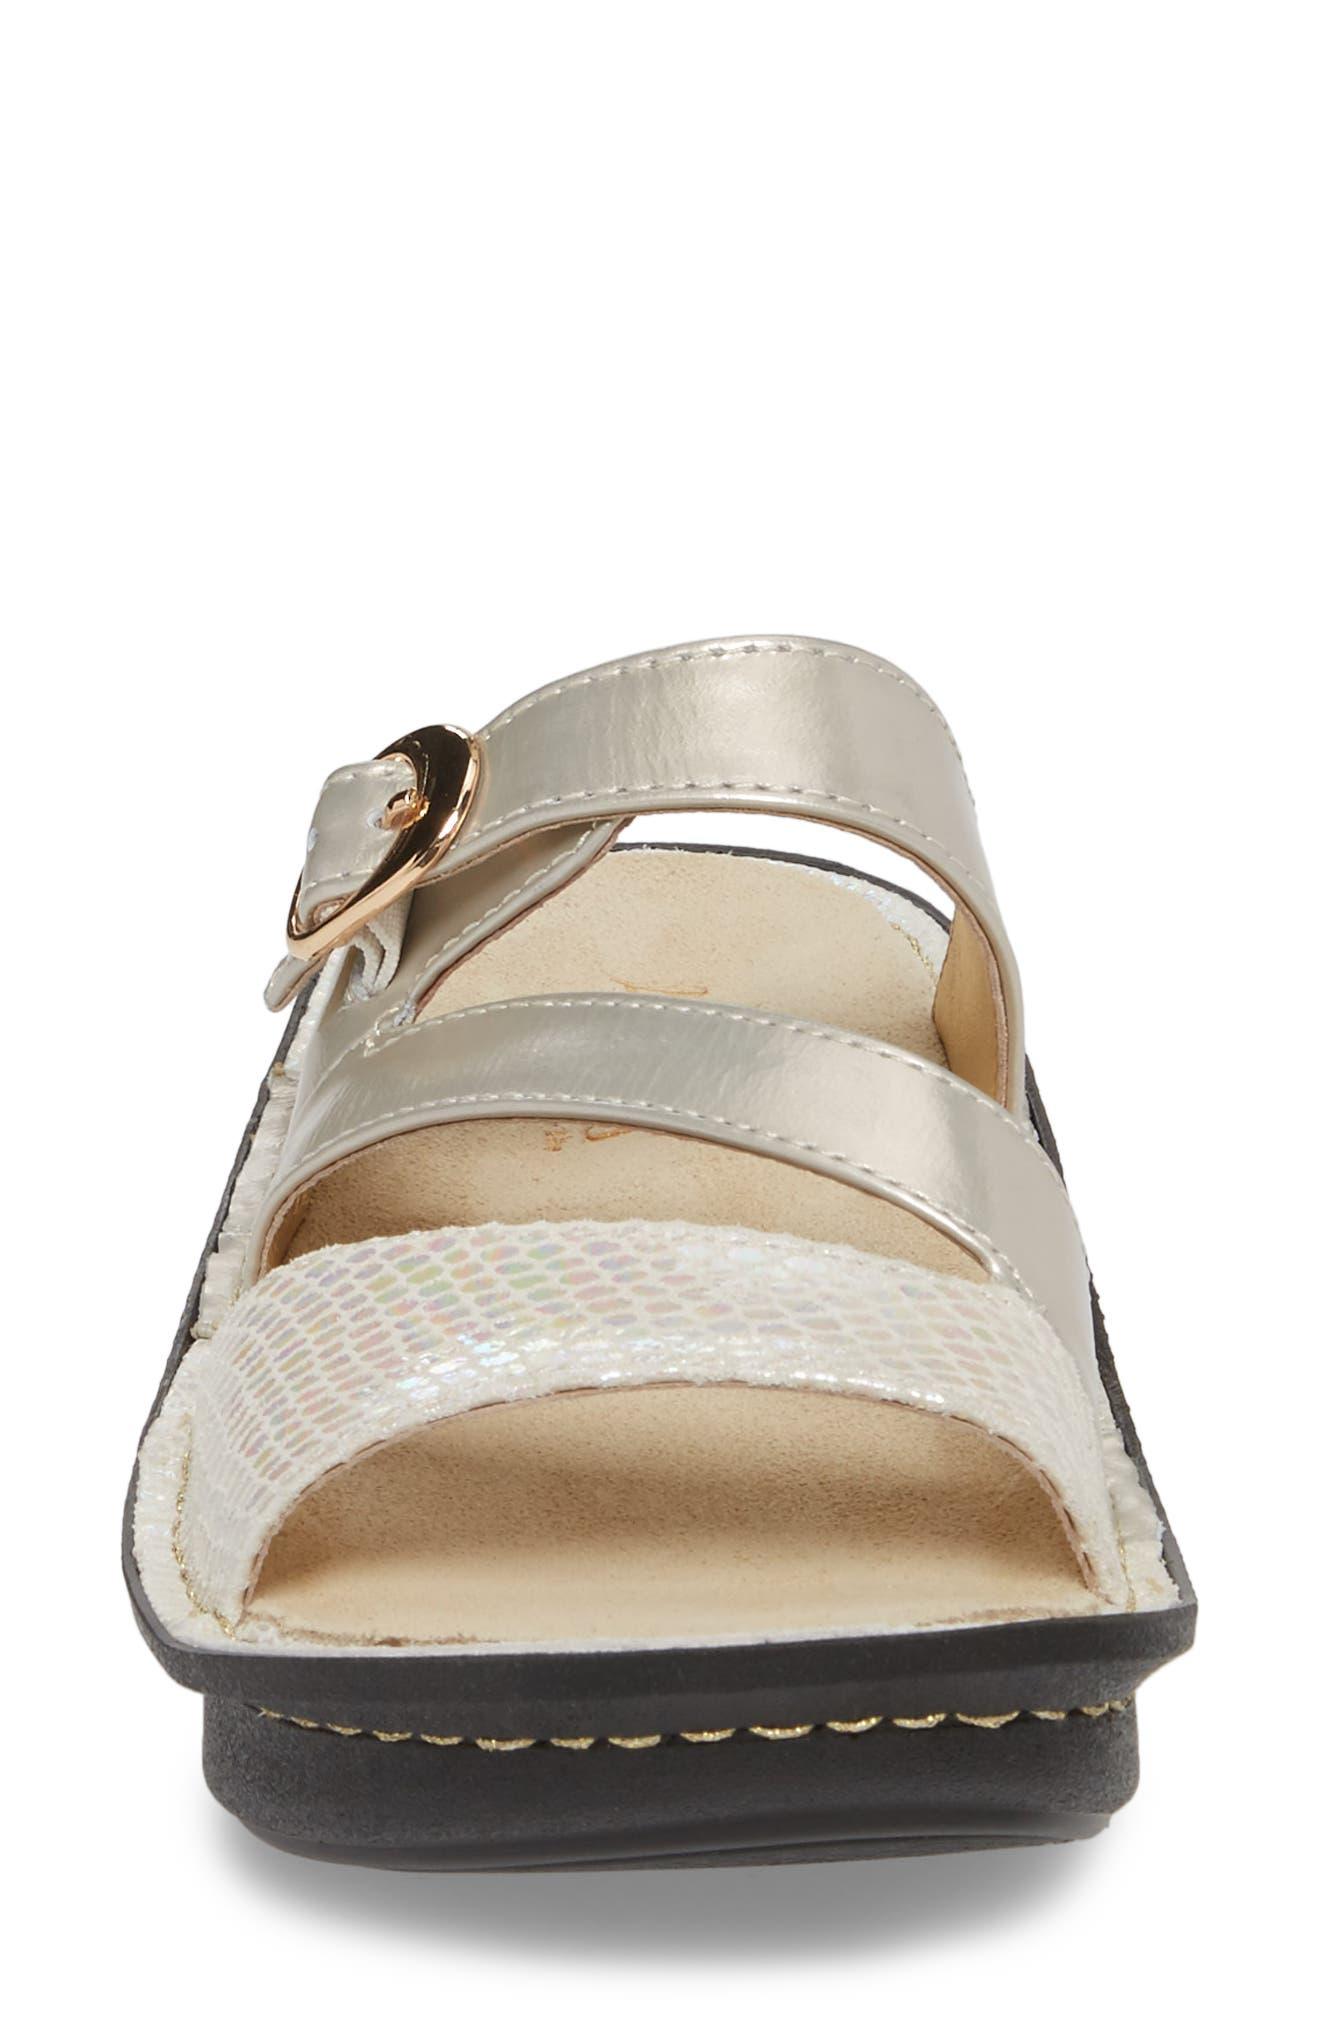 'Colette' Platform Sandal,                             Alternate thumbnail 4, color,                             Opfully Leather